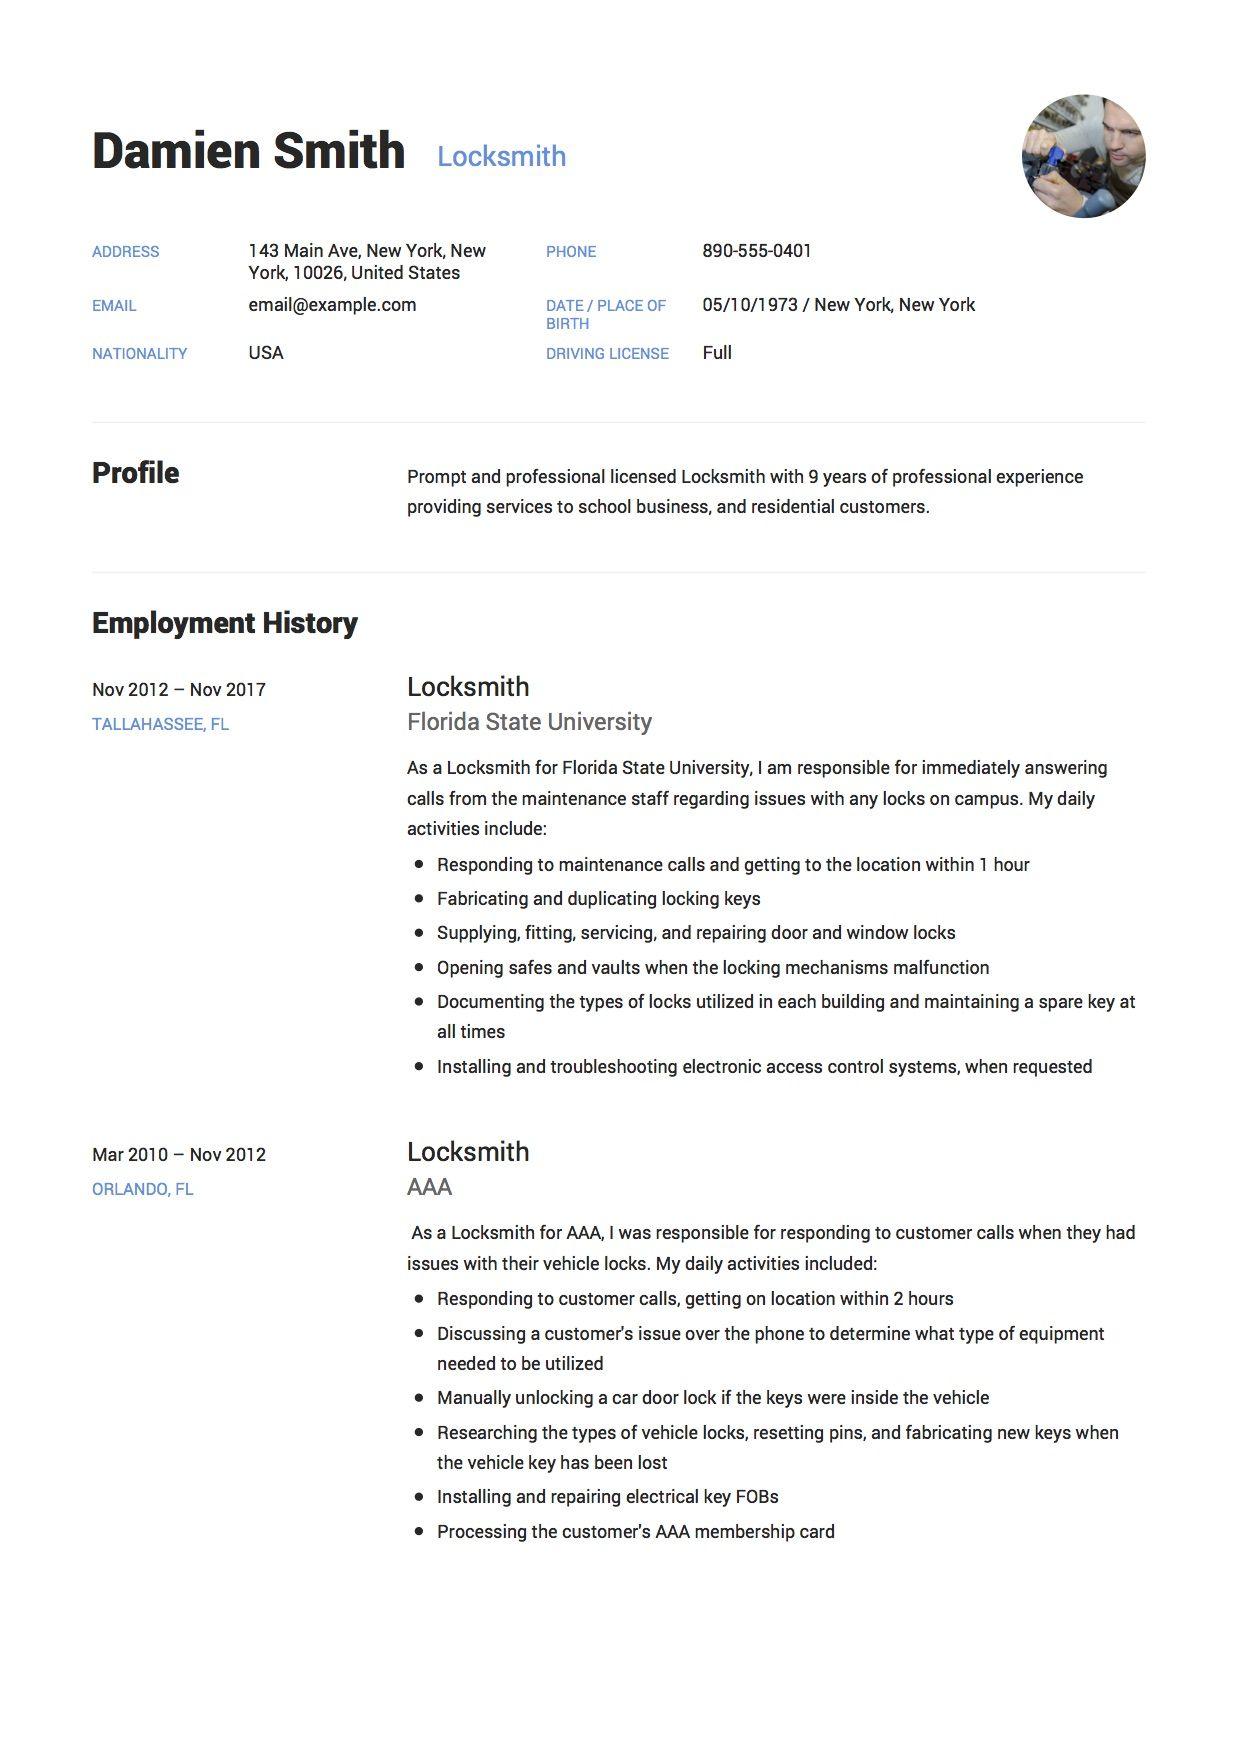 Locksmith Resume Writing Guide 12 Samples Resume Examples